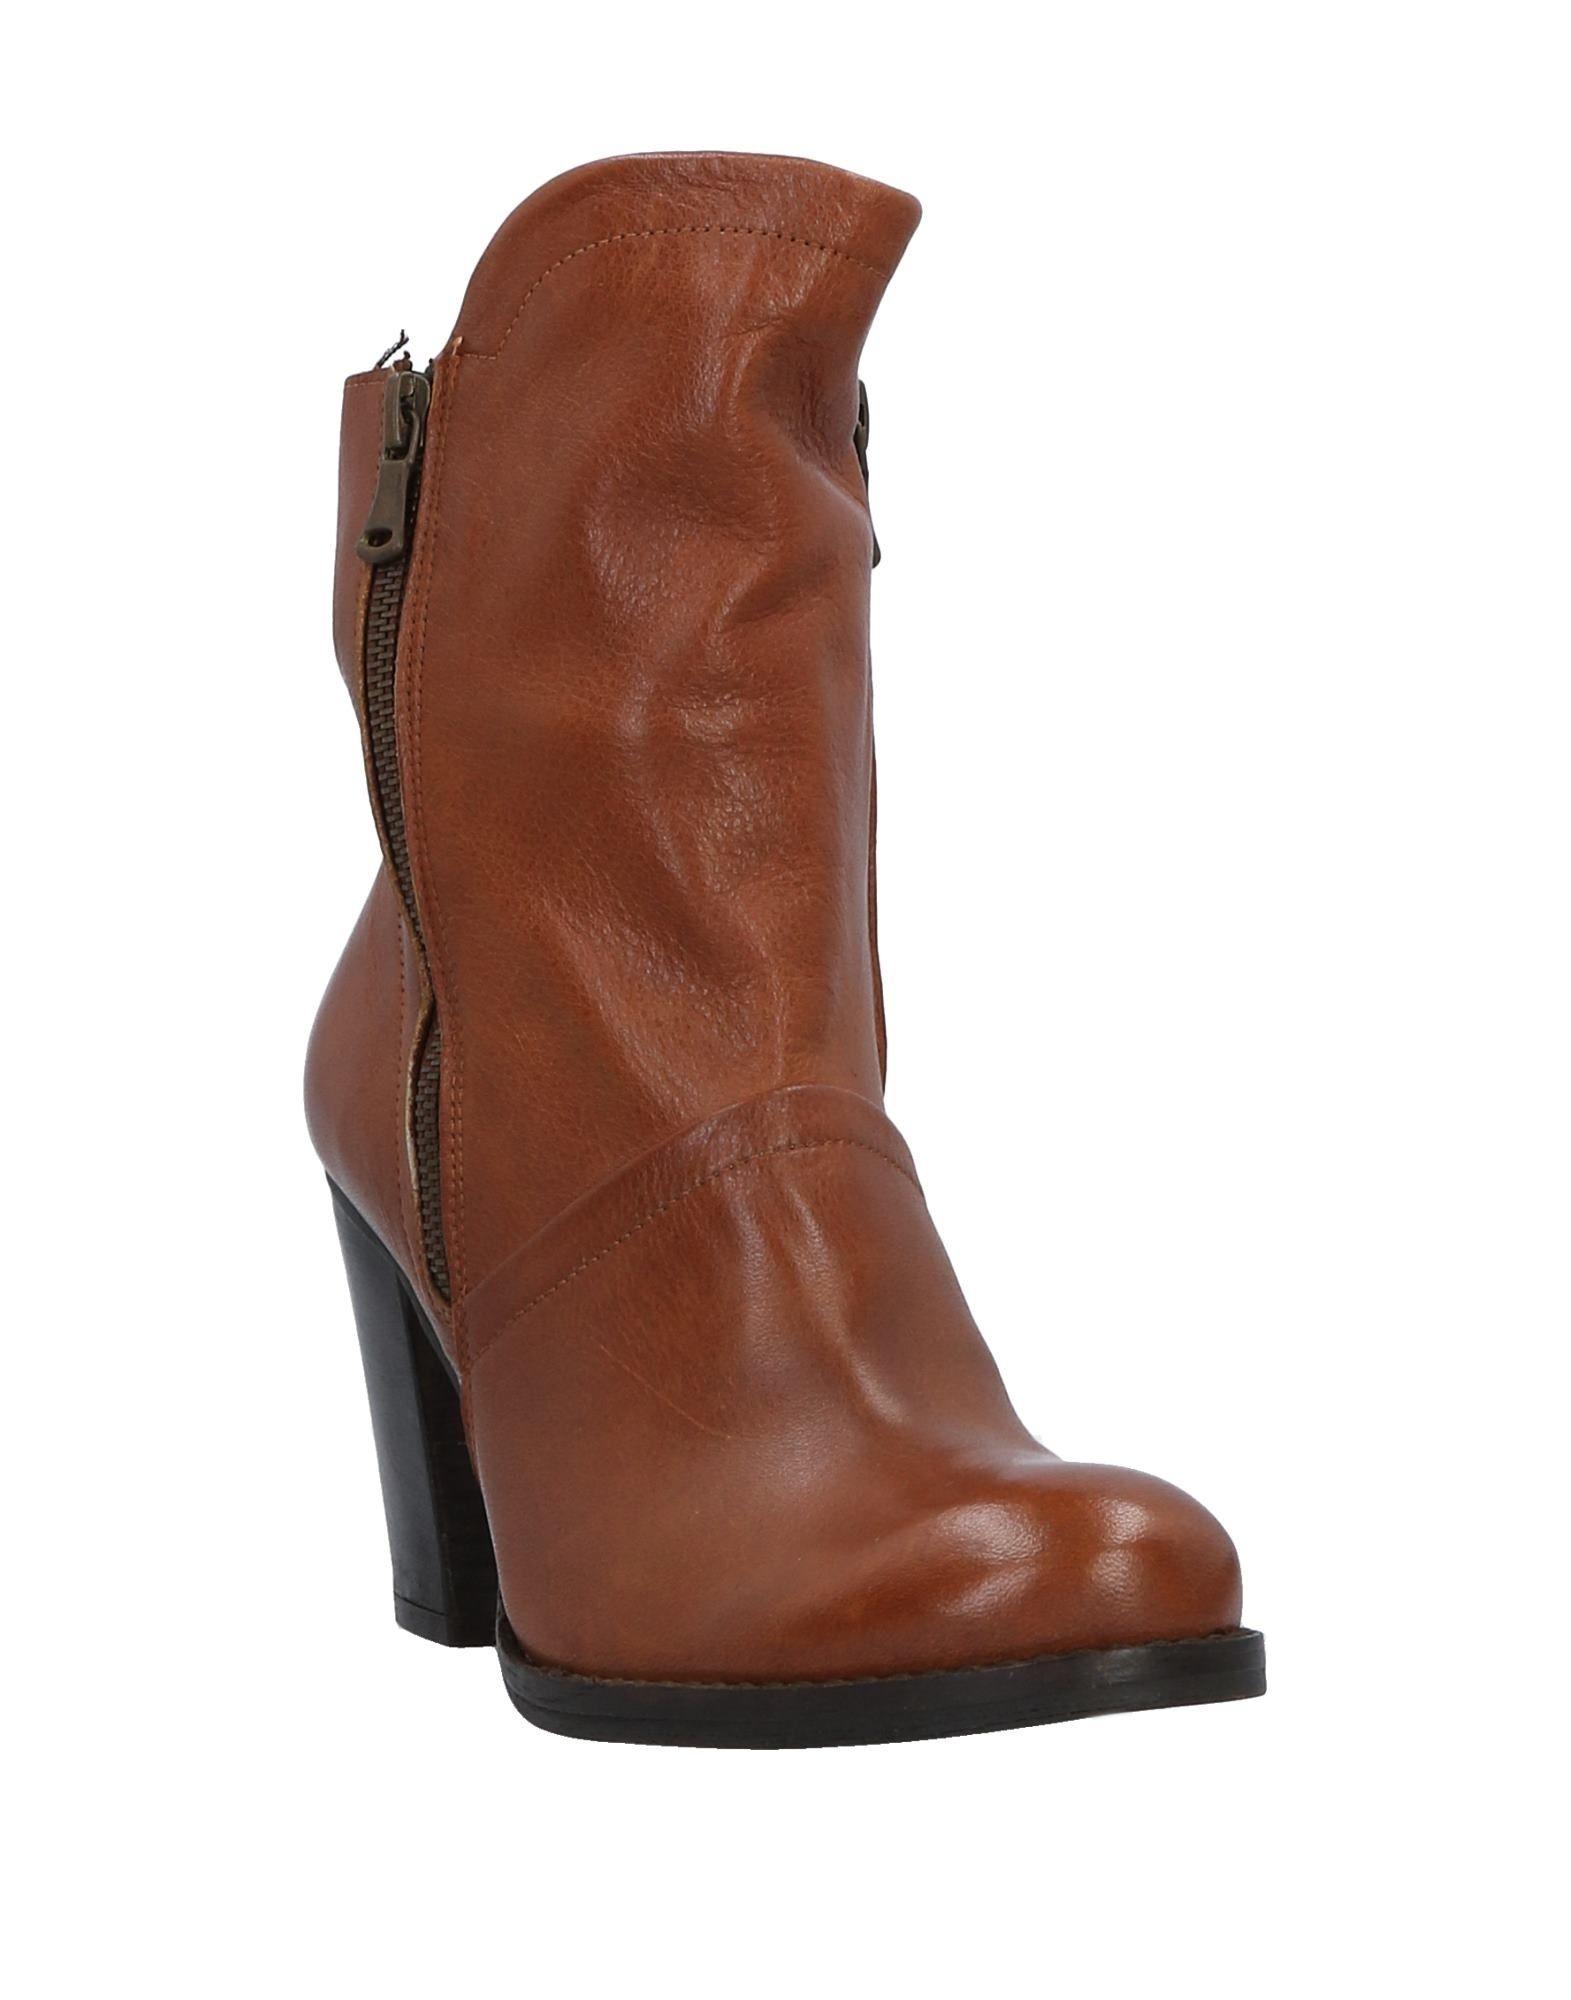 Tsakiris Mallas Stiefelette Damen  Schuhe 11523153WU Gute Qualität beliebte Schuhe  f8ab42